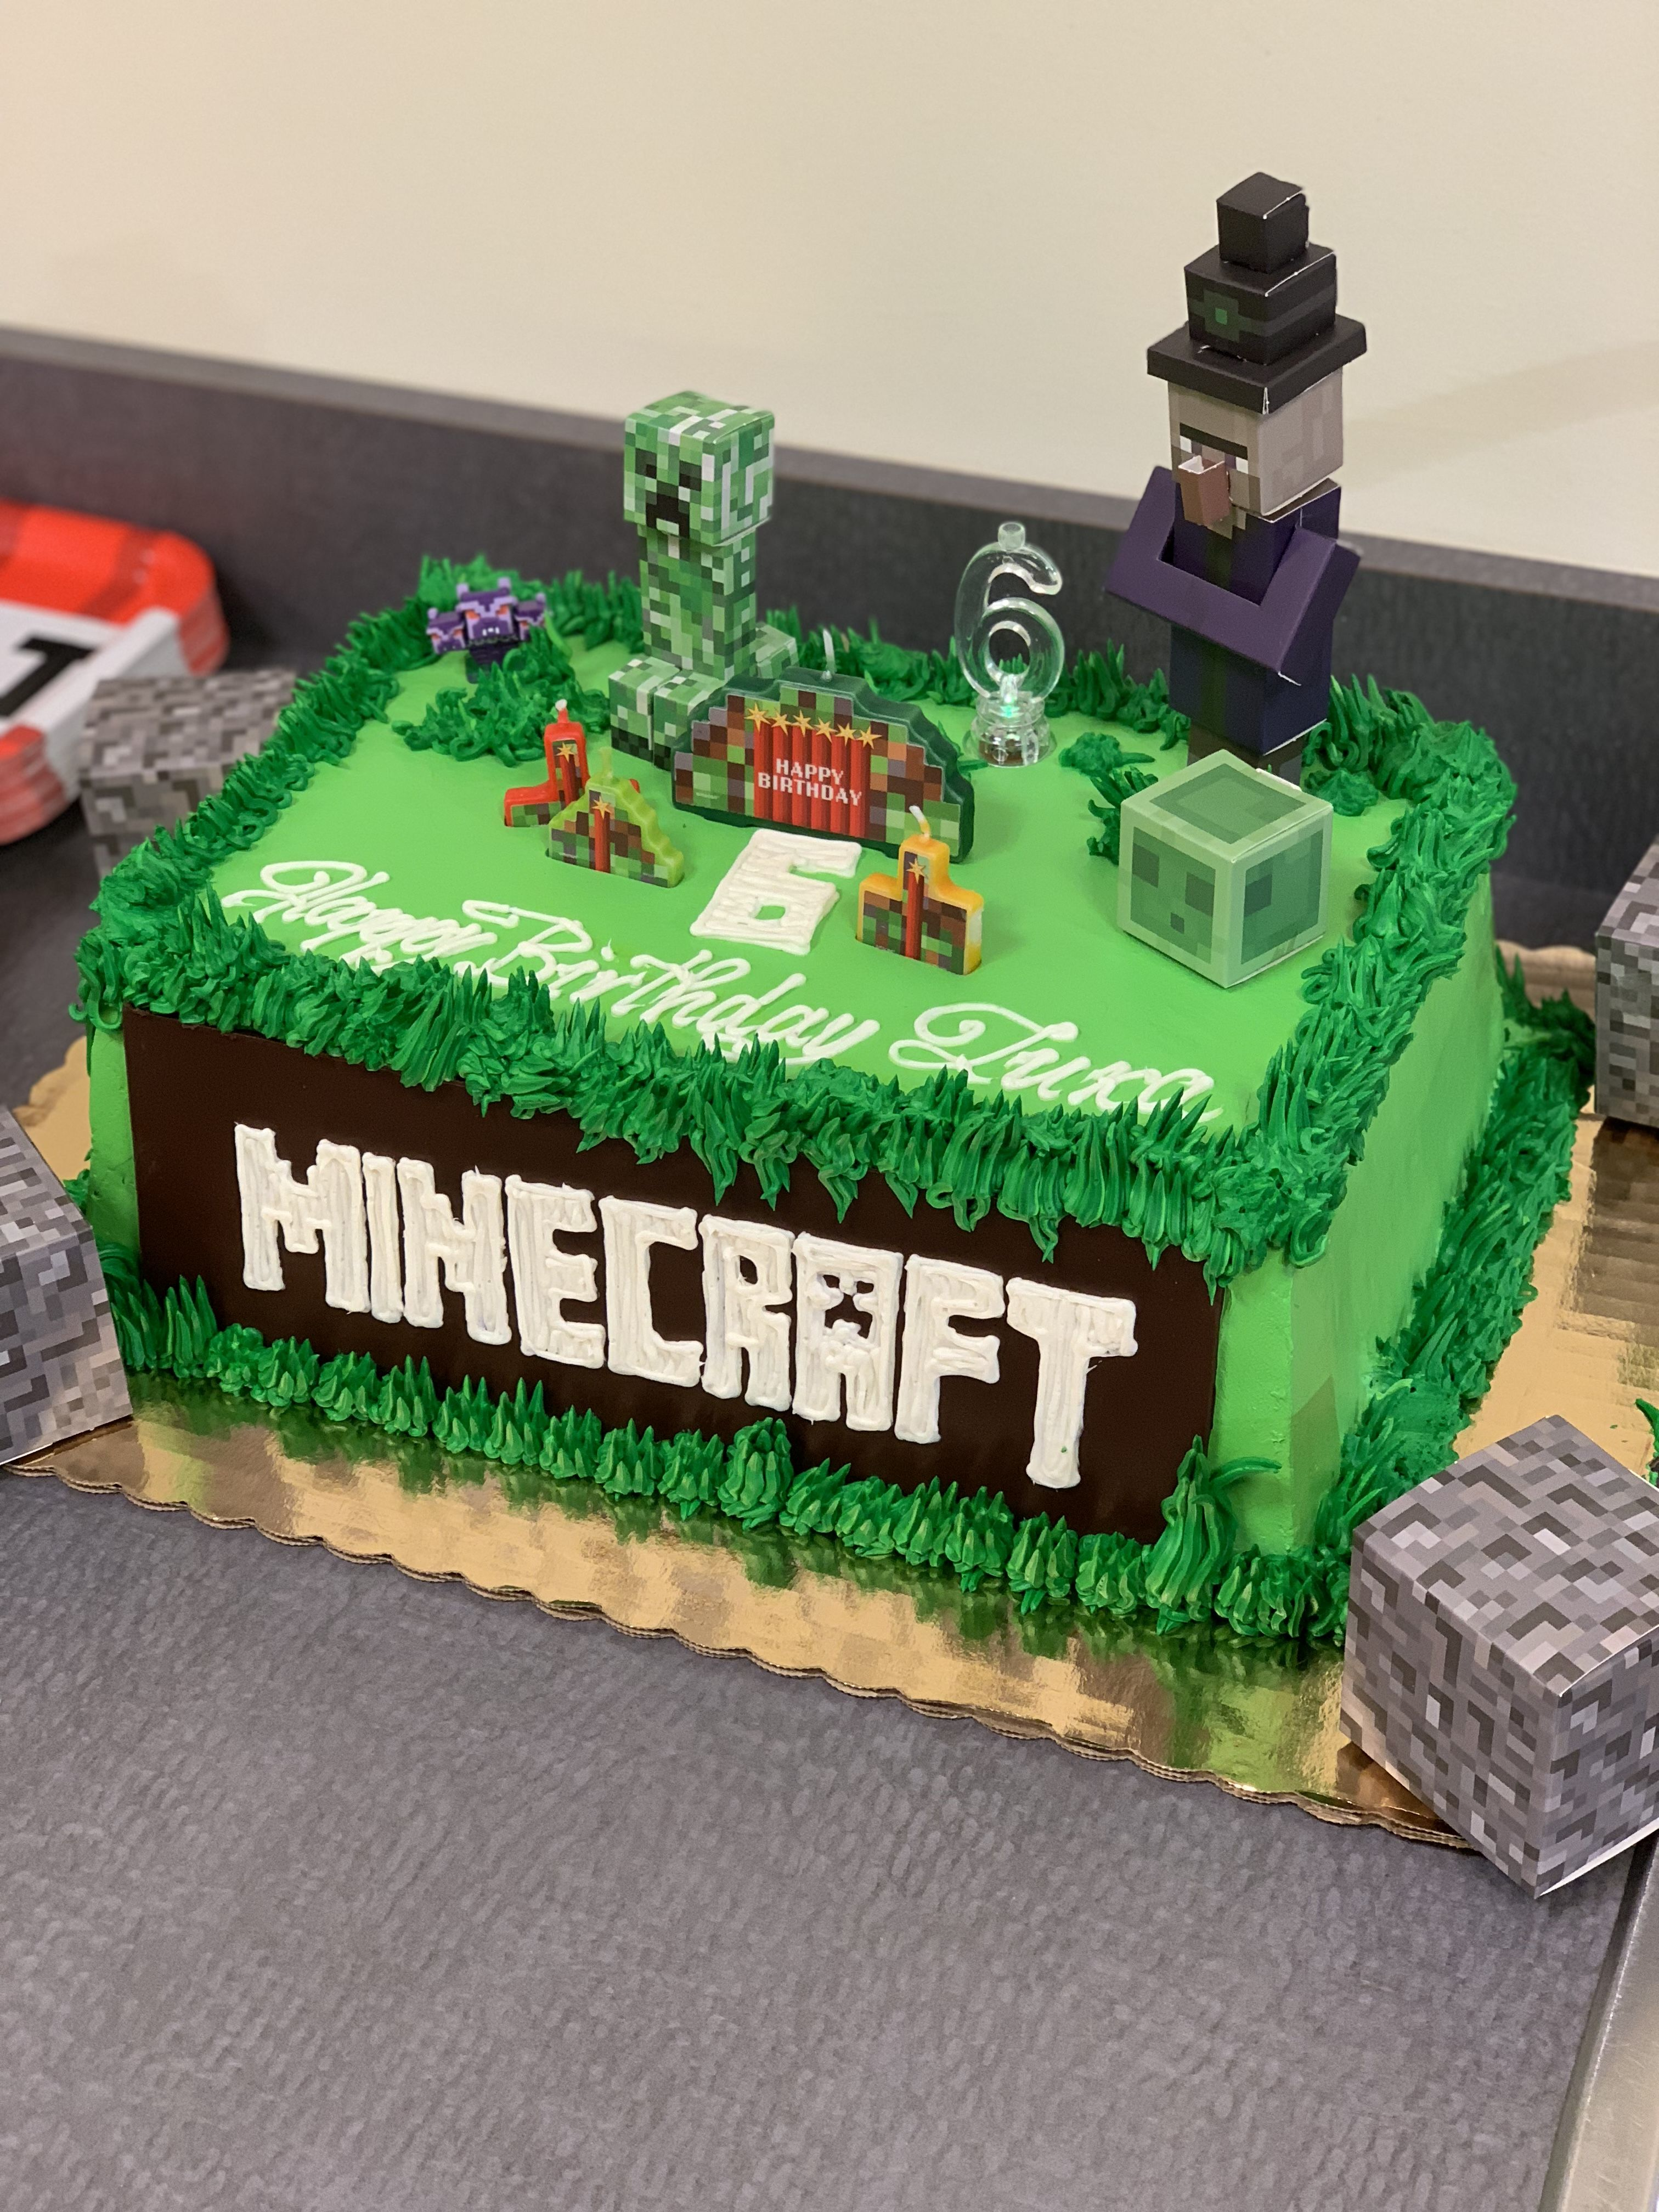 Minecraft birthday cake decorations  Ideias de festa de